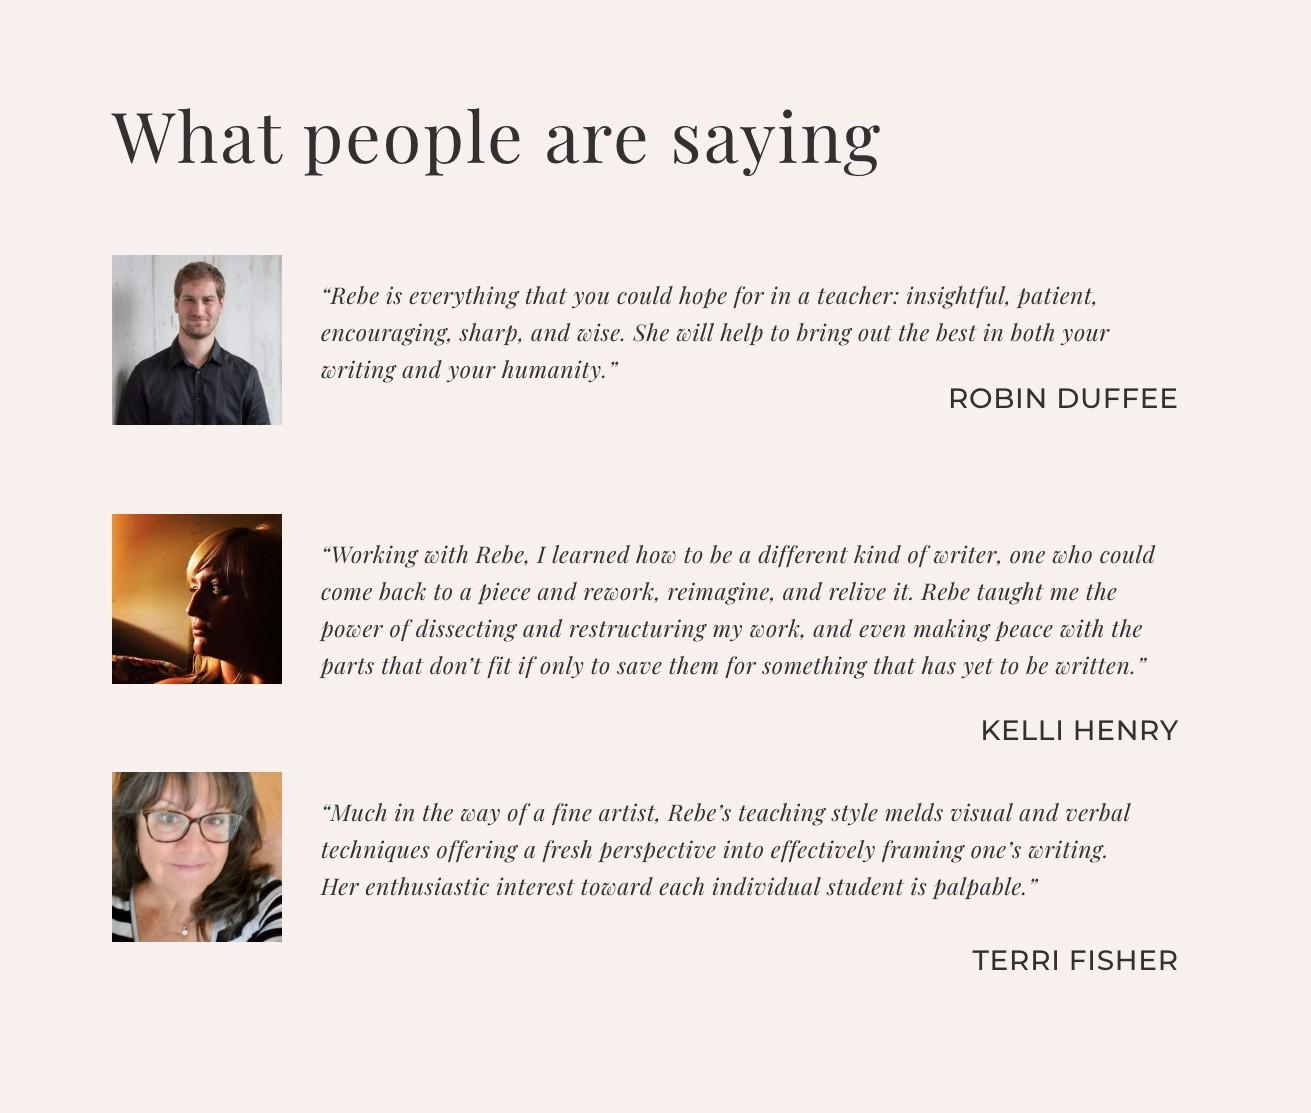 Testimonials about wriitng coach Rebe Huntman's courses from Robin Duffee, Kelli Henry & Terri Fisher